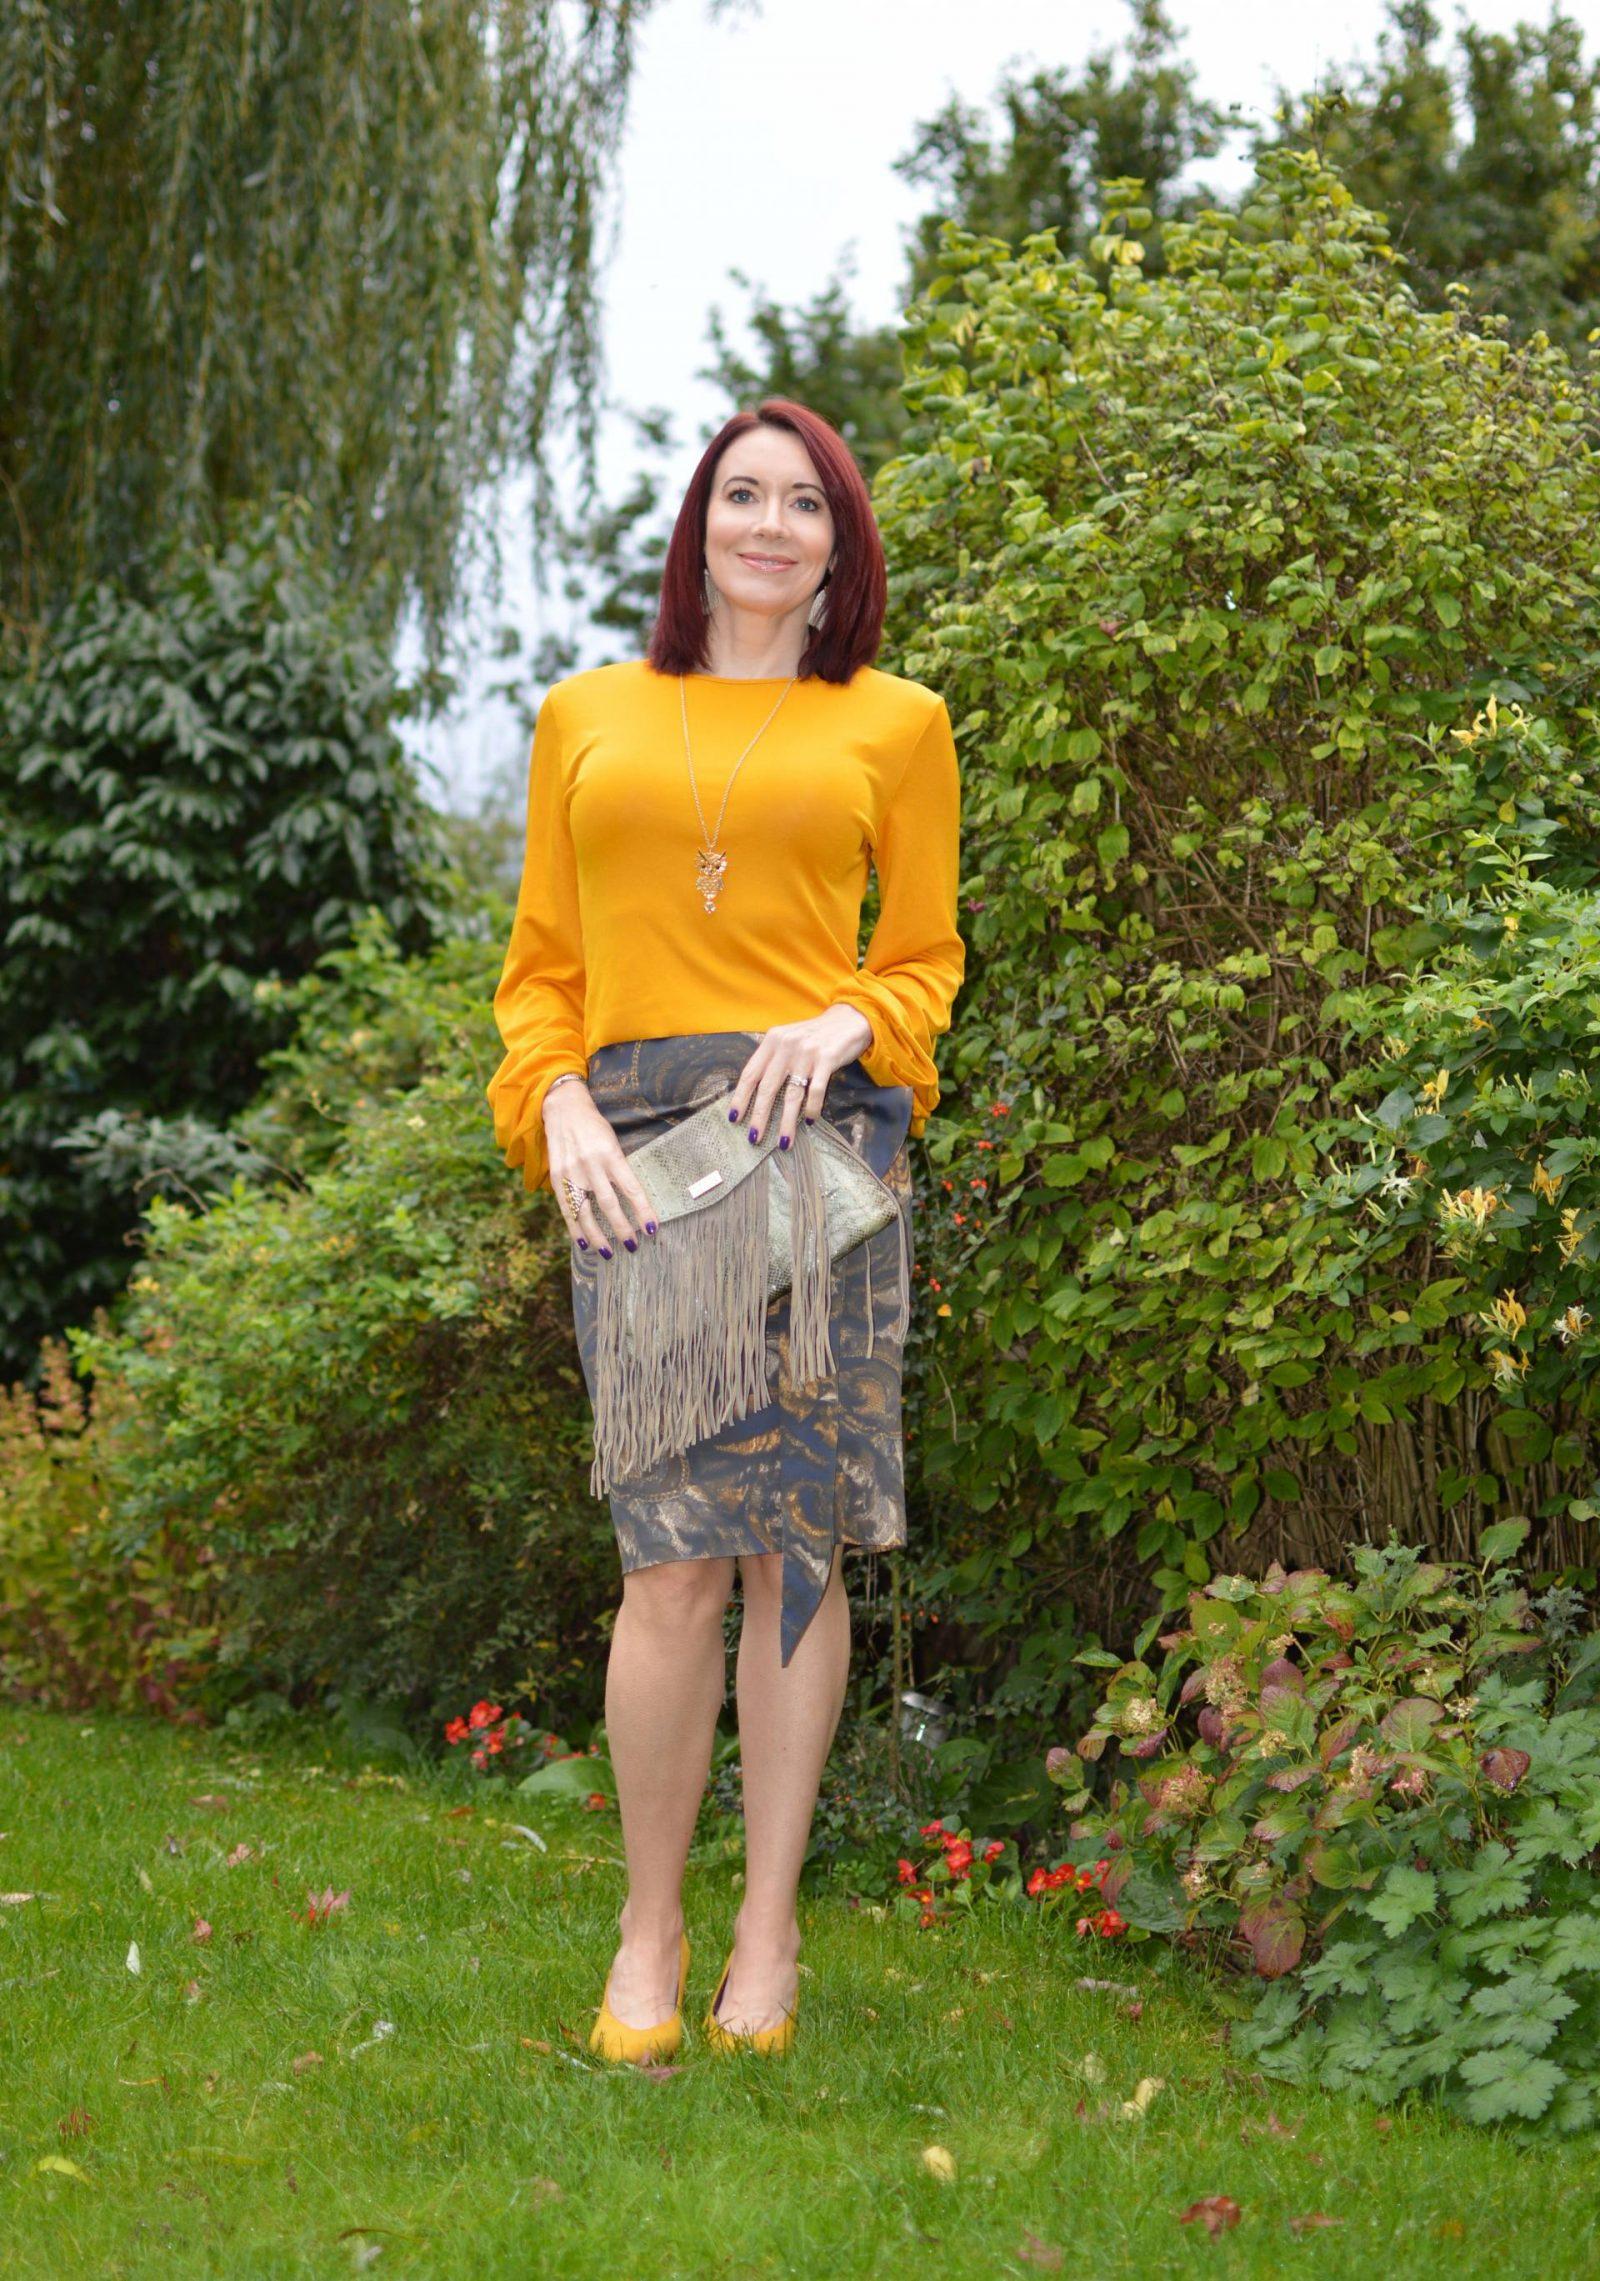 Karen Millen Frill skirt and Zara mustard top, Angel Jackson fringed bag